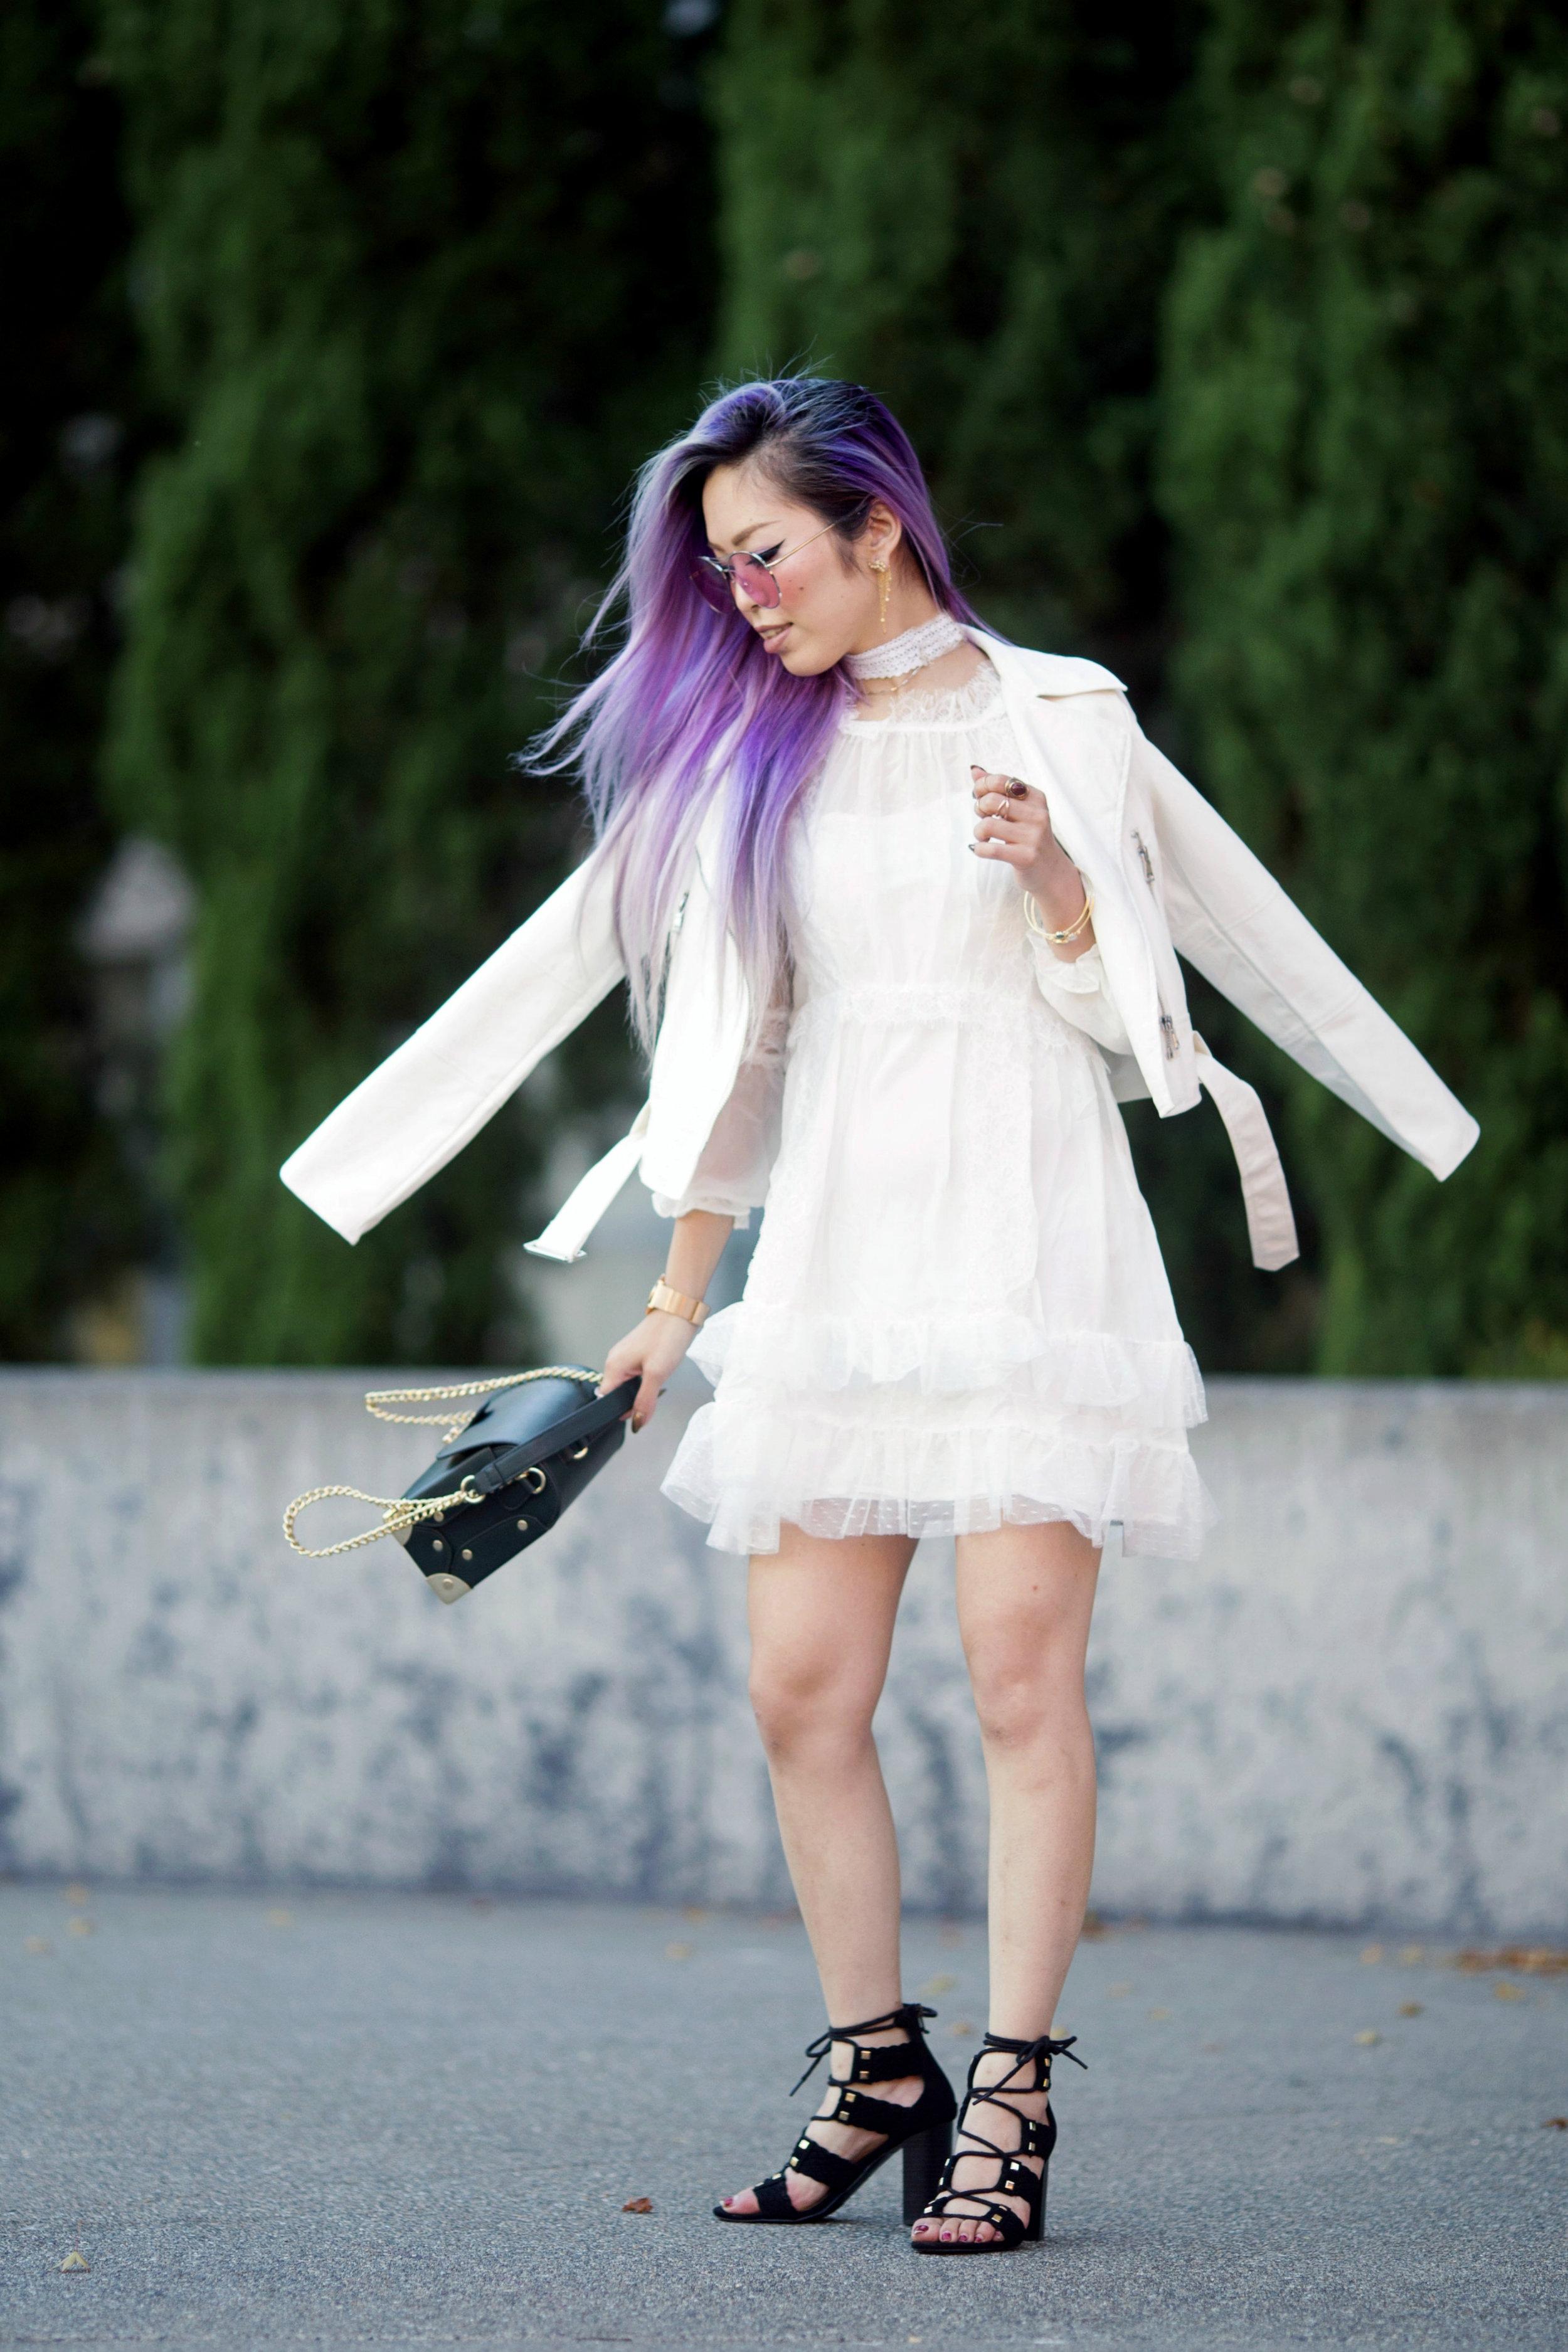 DEZZAL Letter Print White Biker Jacket & Lace Hem Layered Dress_Forever 21 Olive Bag_White Lace Choker_JustFab Lace Up Sandals_Pink Retro Sunglasses_Aikas Love Closet_Seattle Fashion Blogger from Japan_Mermaid Hair_Purple Hair